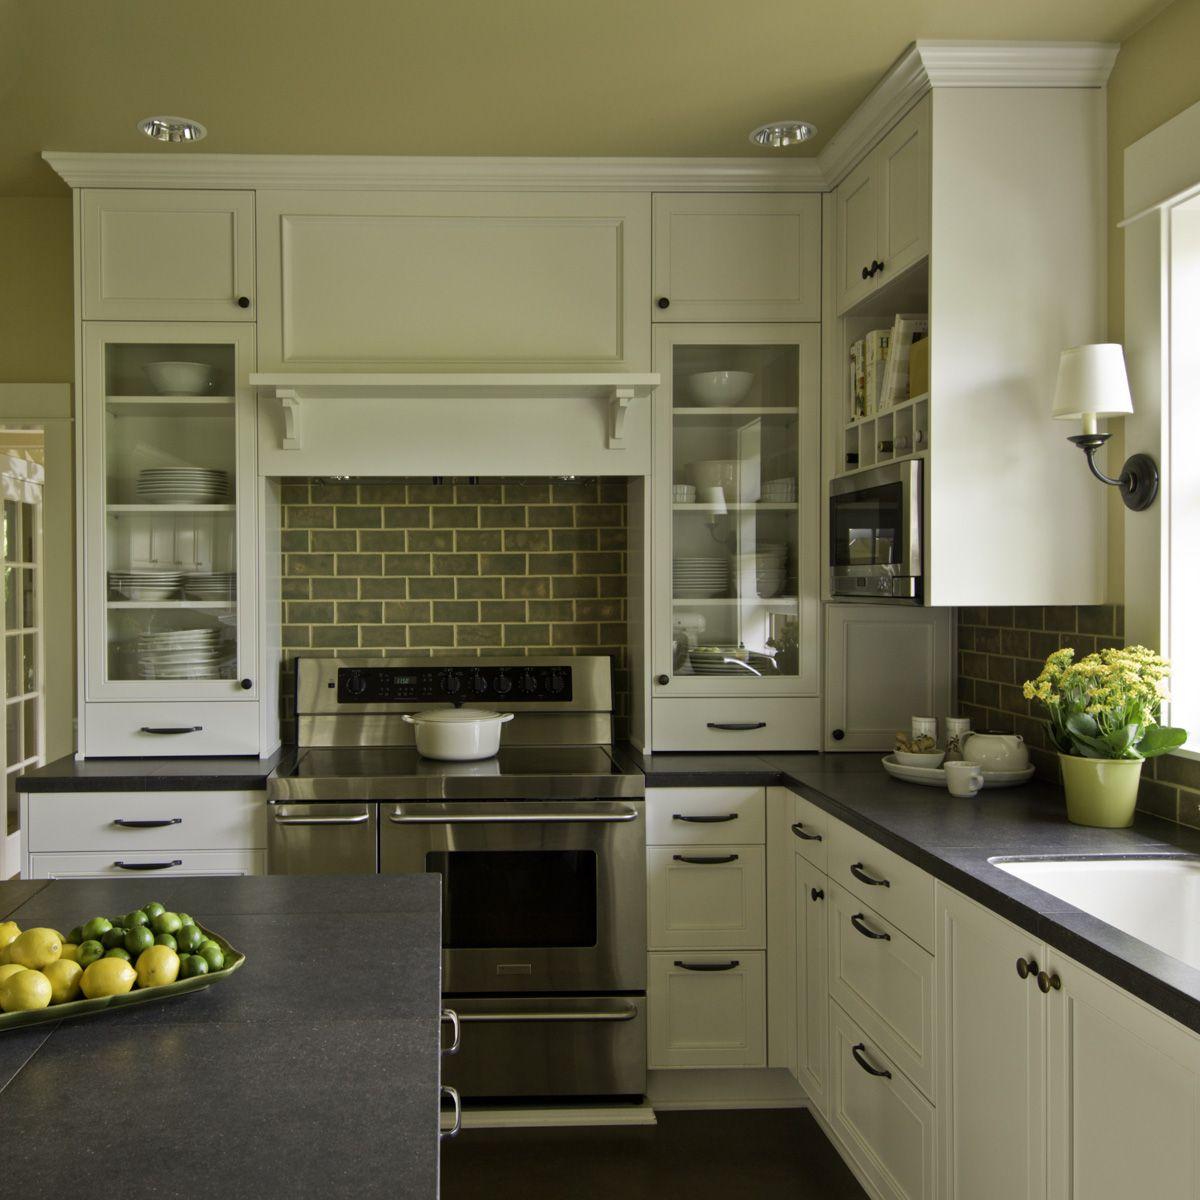 bungalow remodel kitchen classic bungalow kitchen remodel portland oregon mosaik design on kitchen remodel kitchen designs id=26325